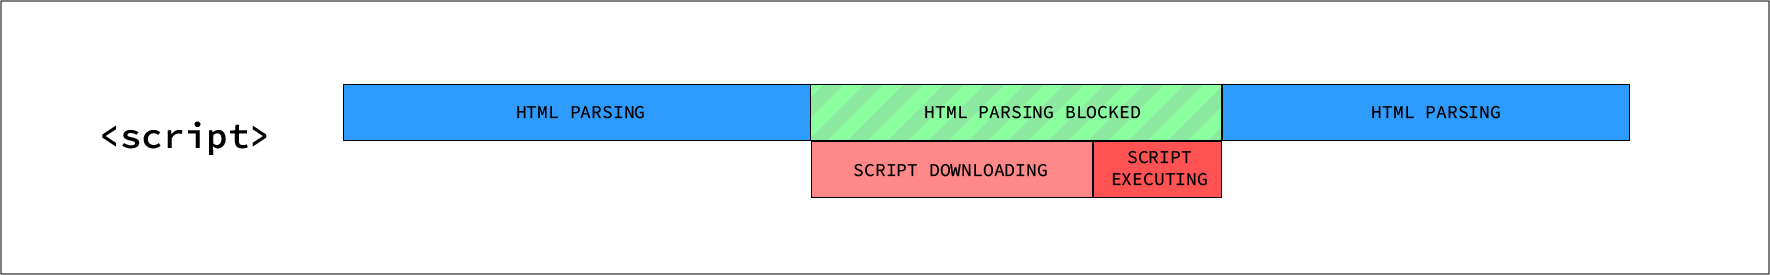 Synchronous script execution